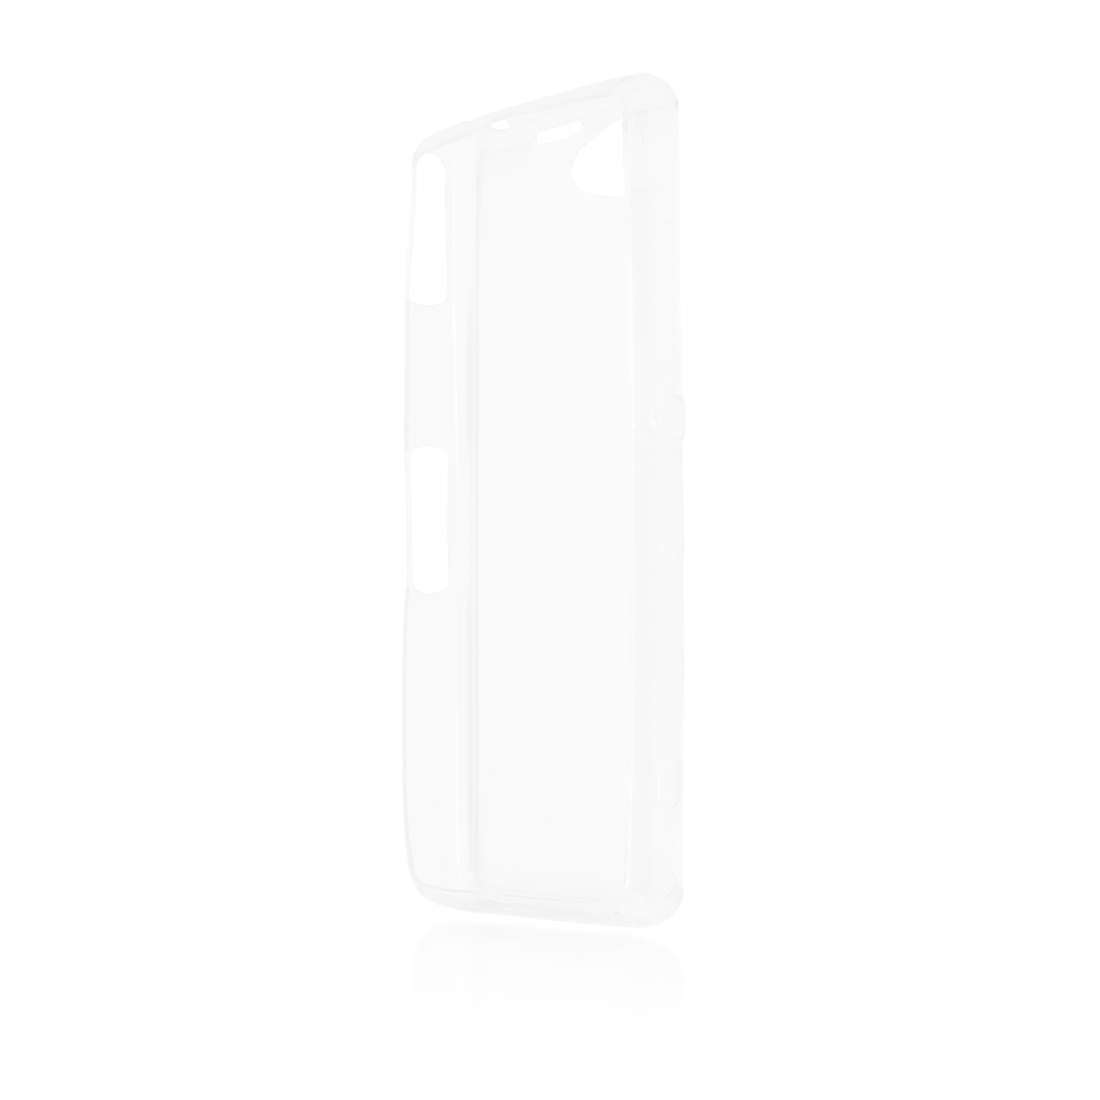 Чехол Brosco для Sony Xperia Z1 Compact, прозрачный чехол brosco для sony xperia z1 compact прозрачный